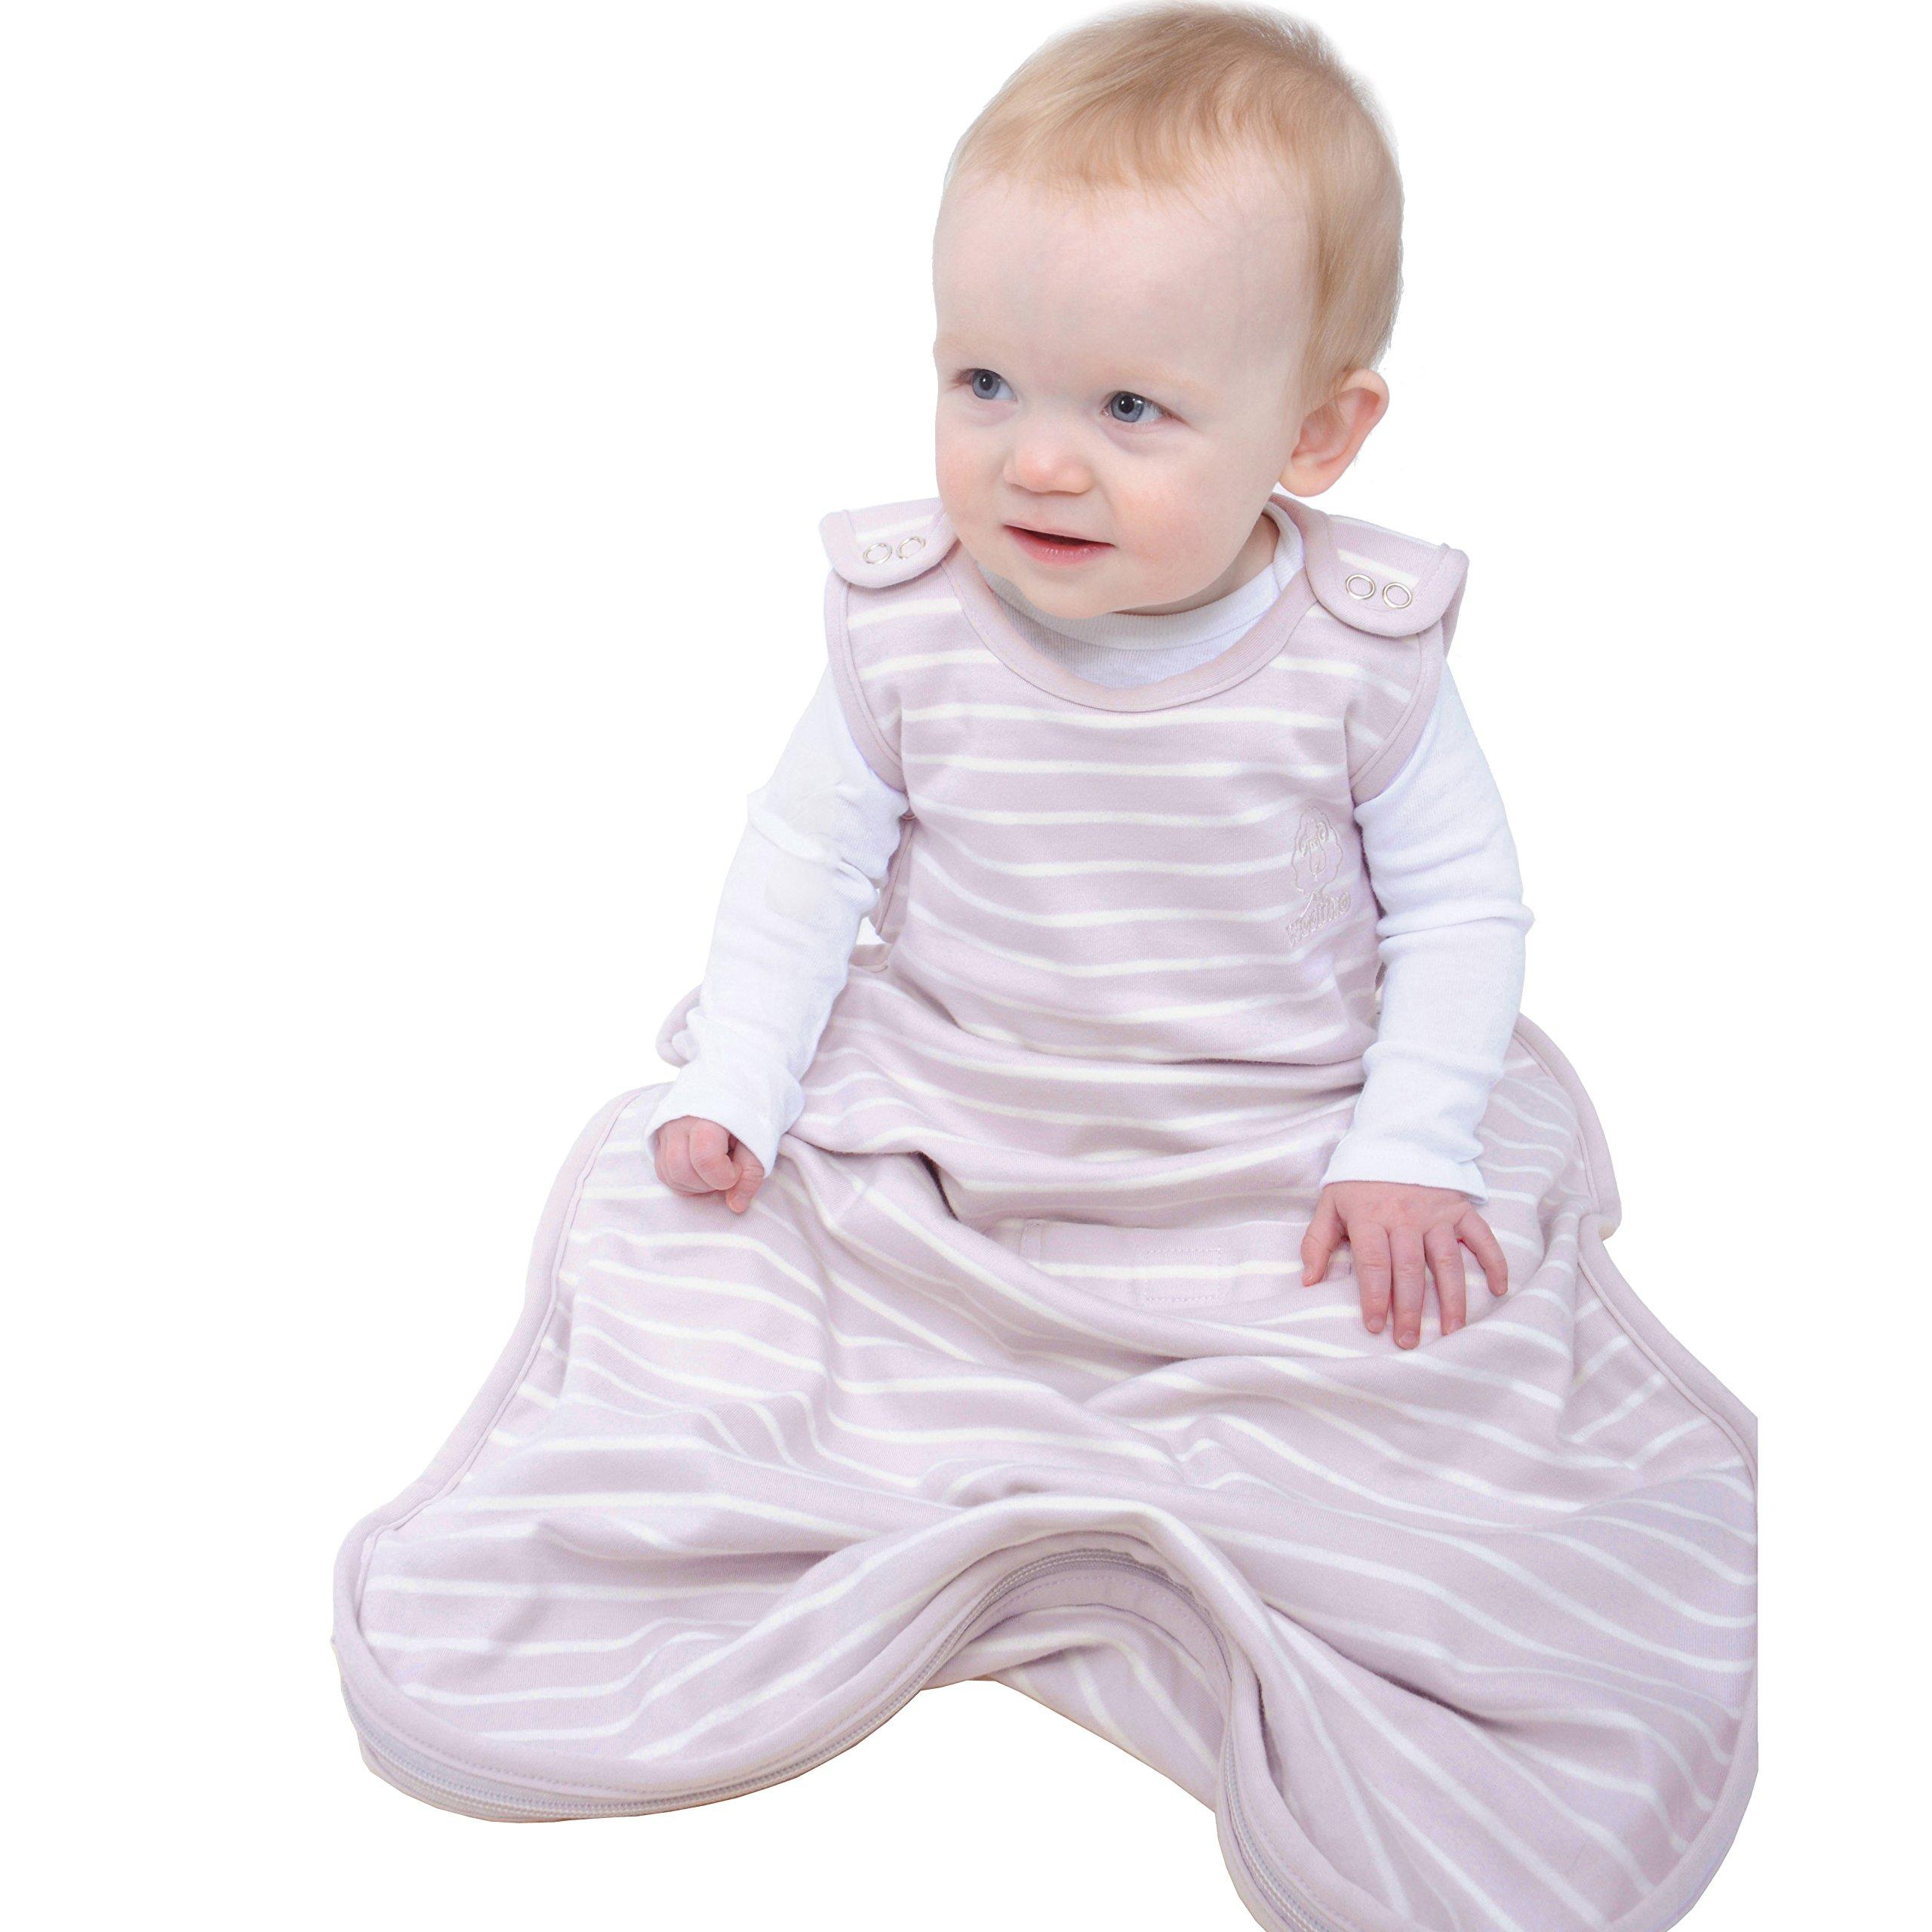 Woolino Merino Wool Baby Sleeping Bag - 4 Season, 2Mo - 2Yrs, Lilac